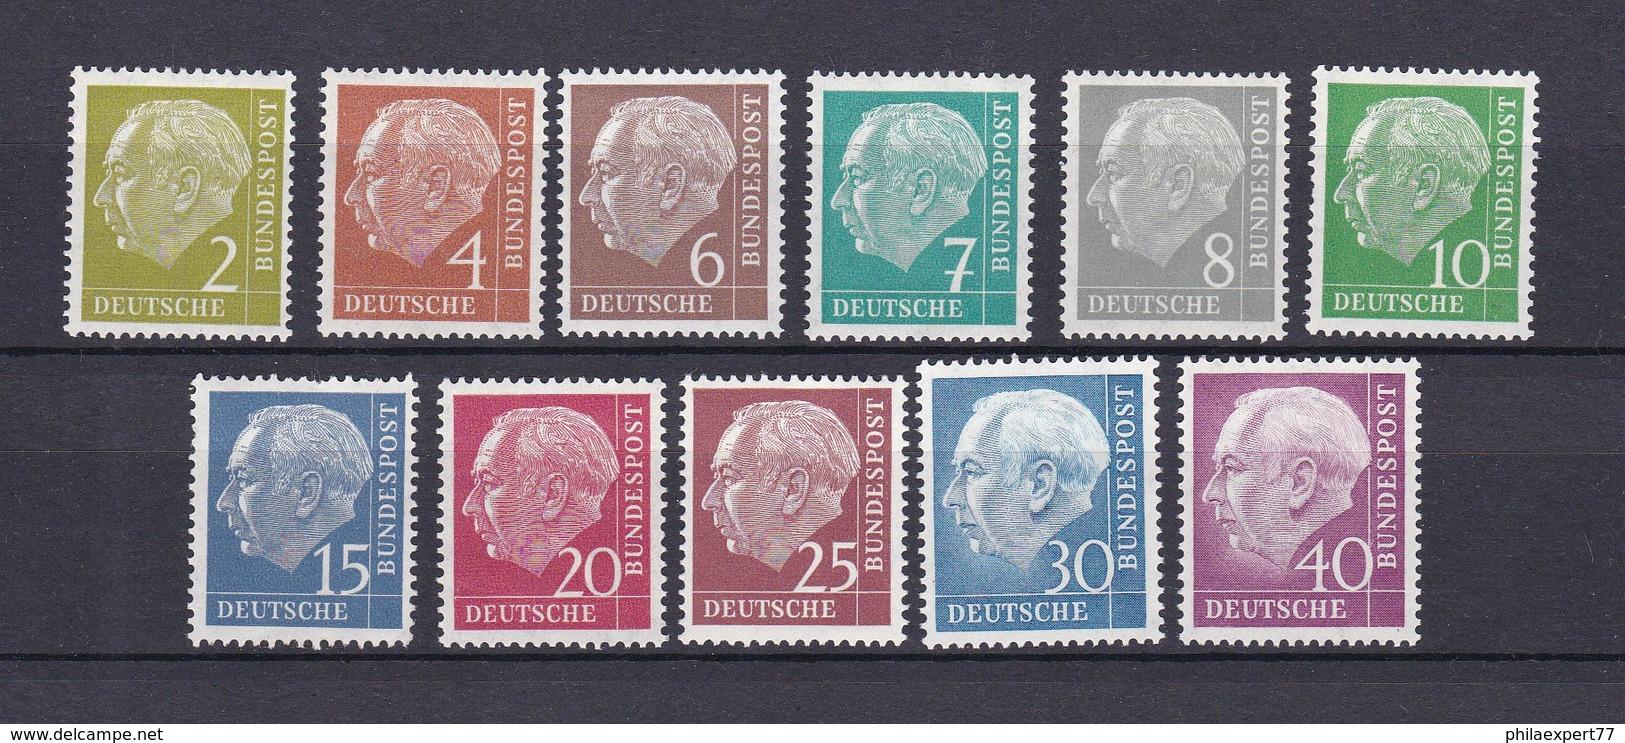 BRD - 1954 - Michel Nr. 177/78+180/188 - Ungebr. - 25 Euro - BRD